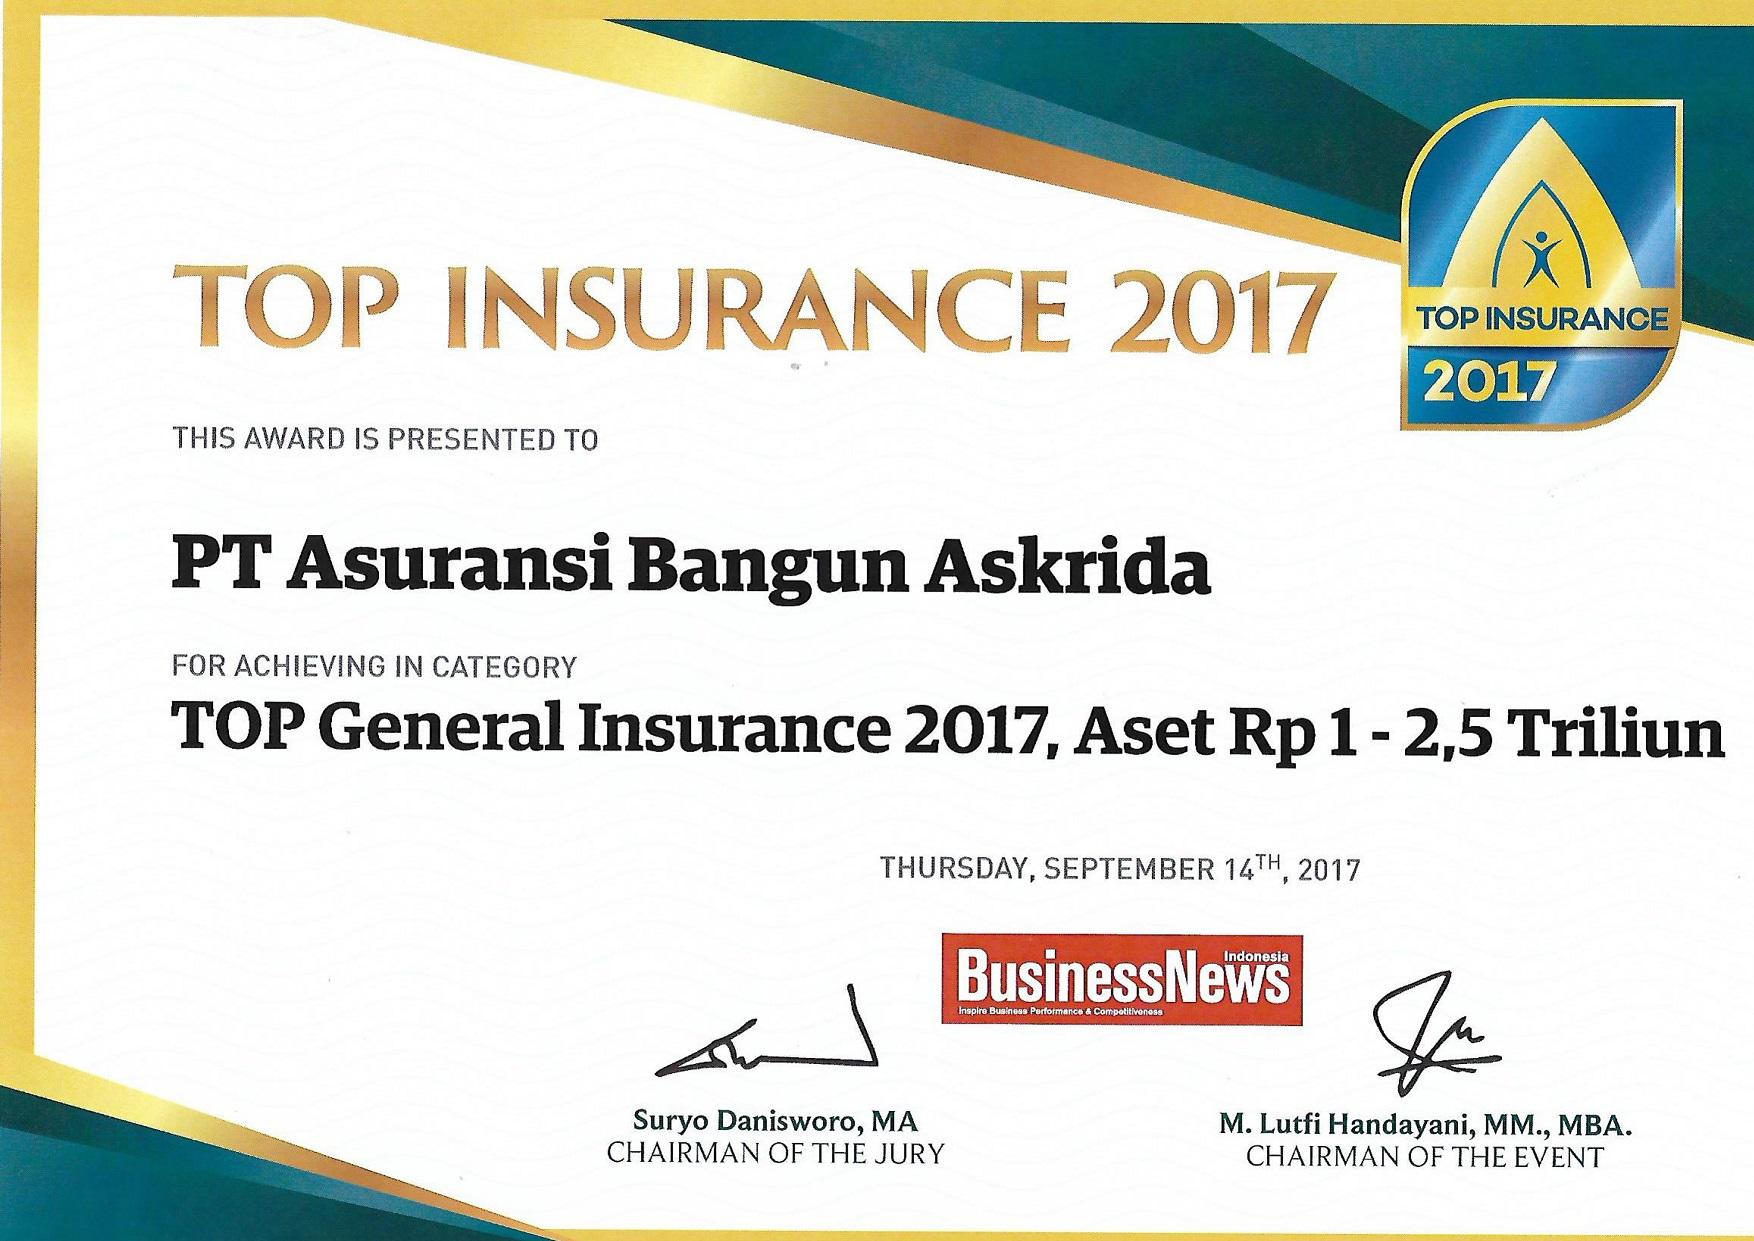 PENGHARGAAN TOP GENERAL INSURANCE 2017 (BusinessNews Indonesia)